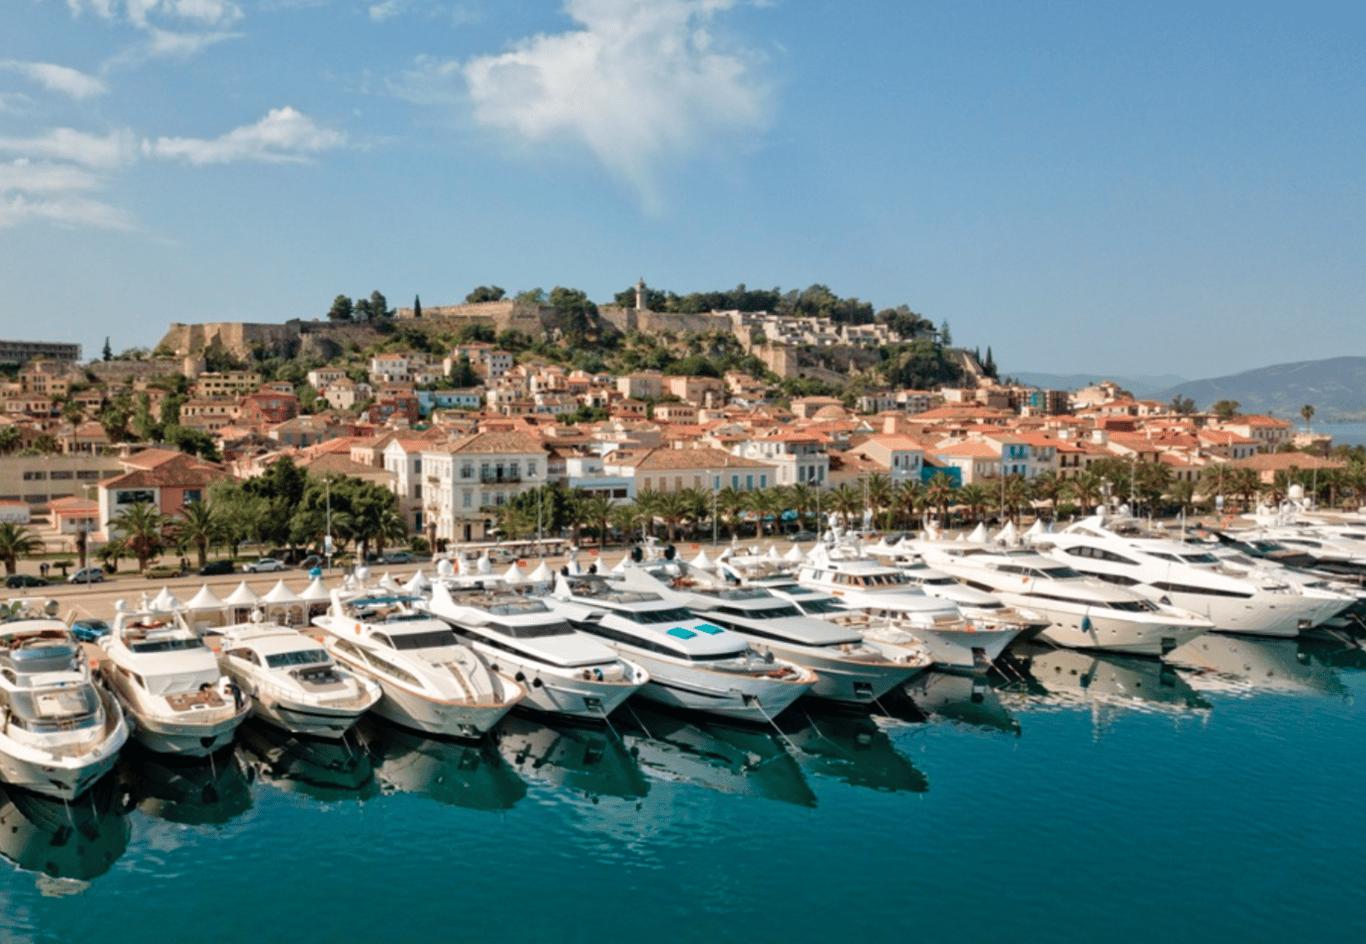 Greece Motor Yacht Charters in Nafplion